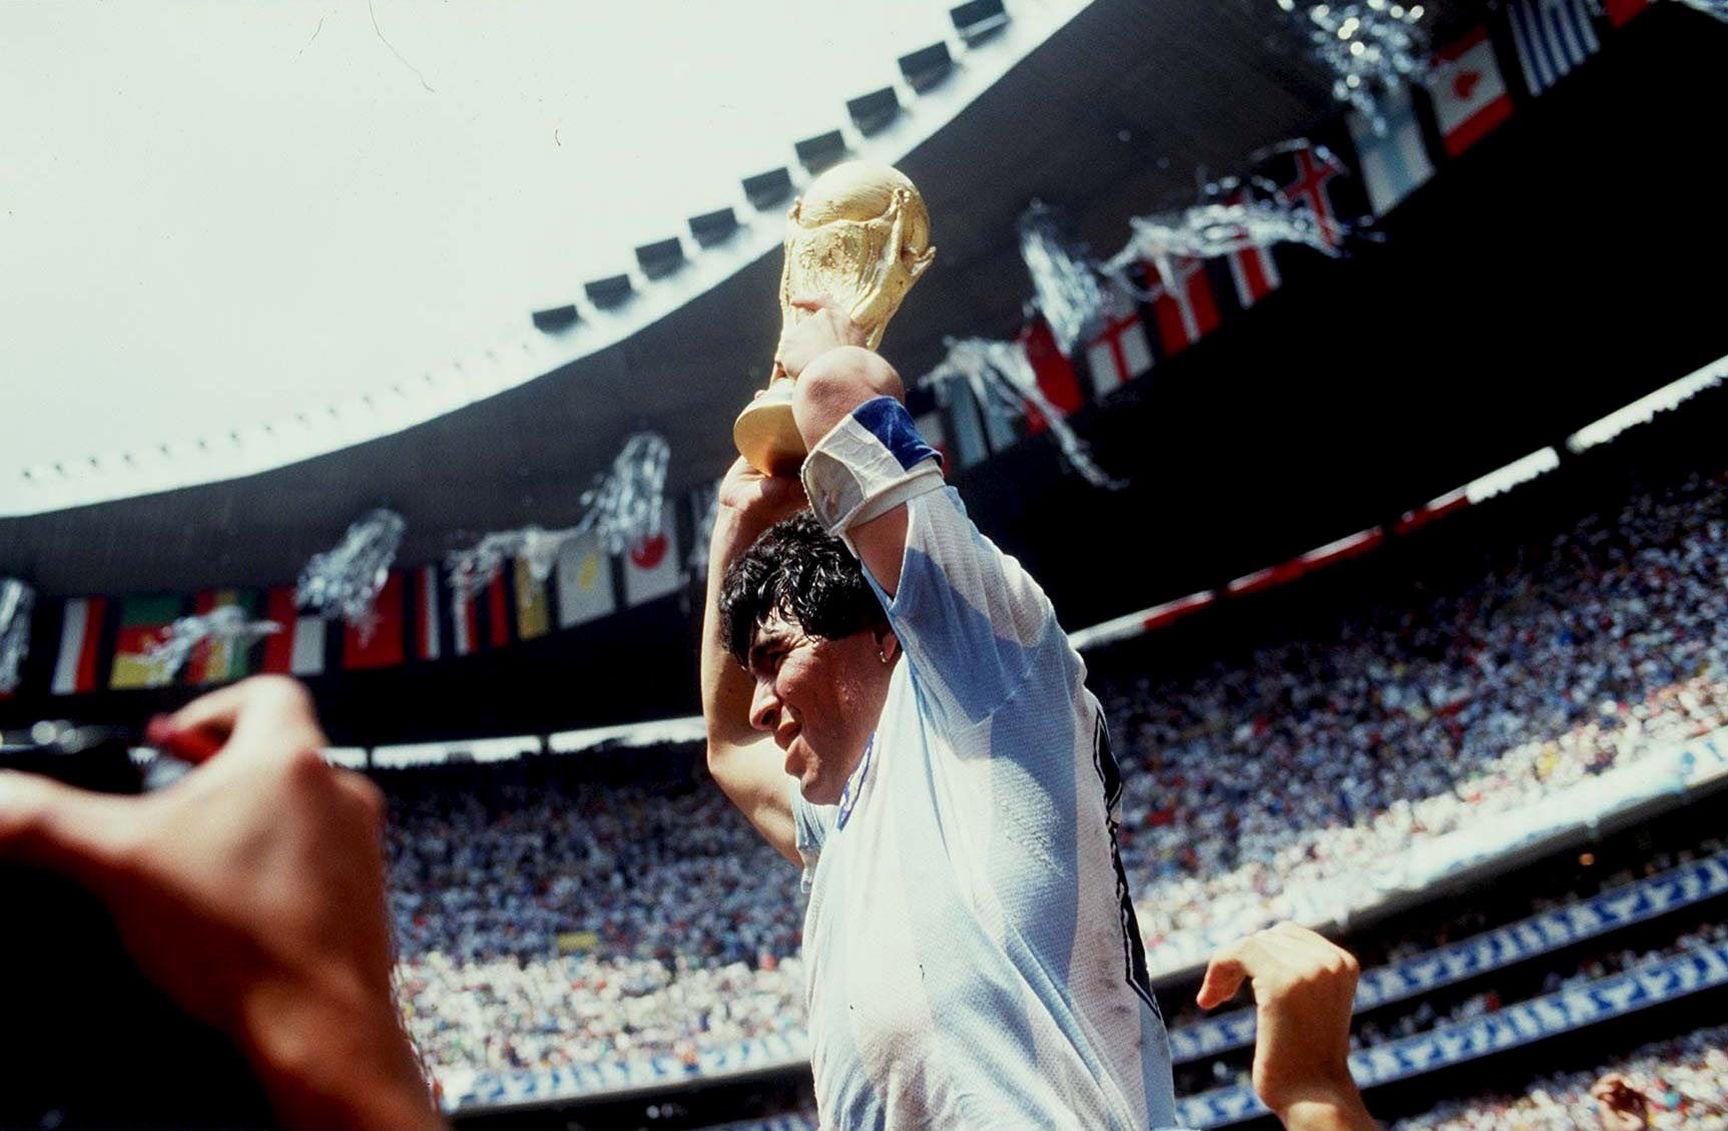 Символ футбола. ФОТО галерея памяти Диего Марадоны - фото 21